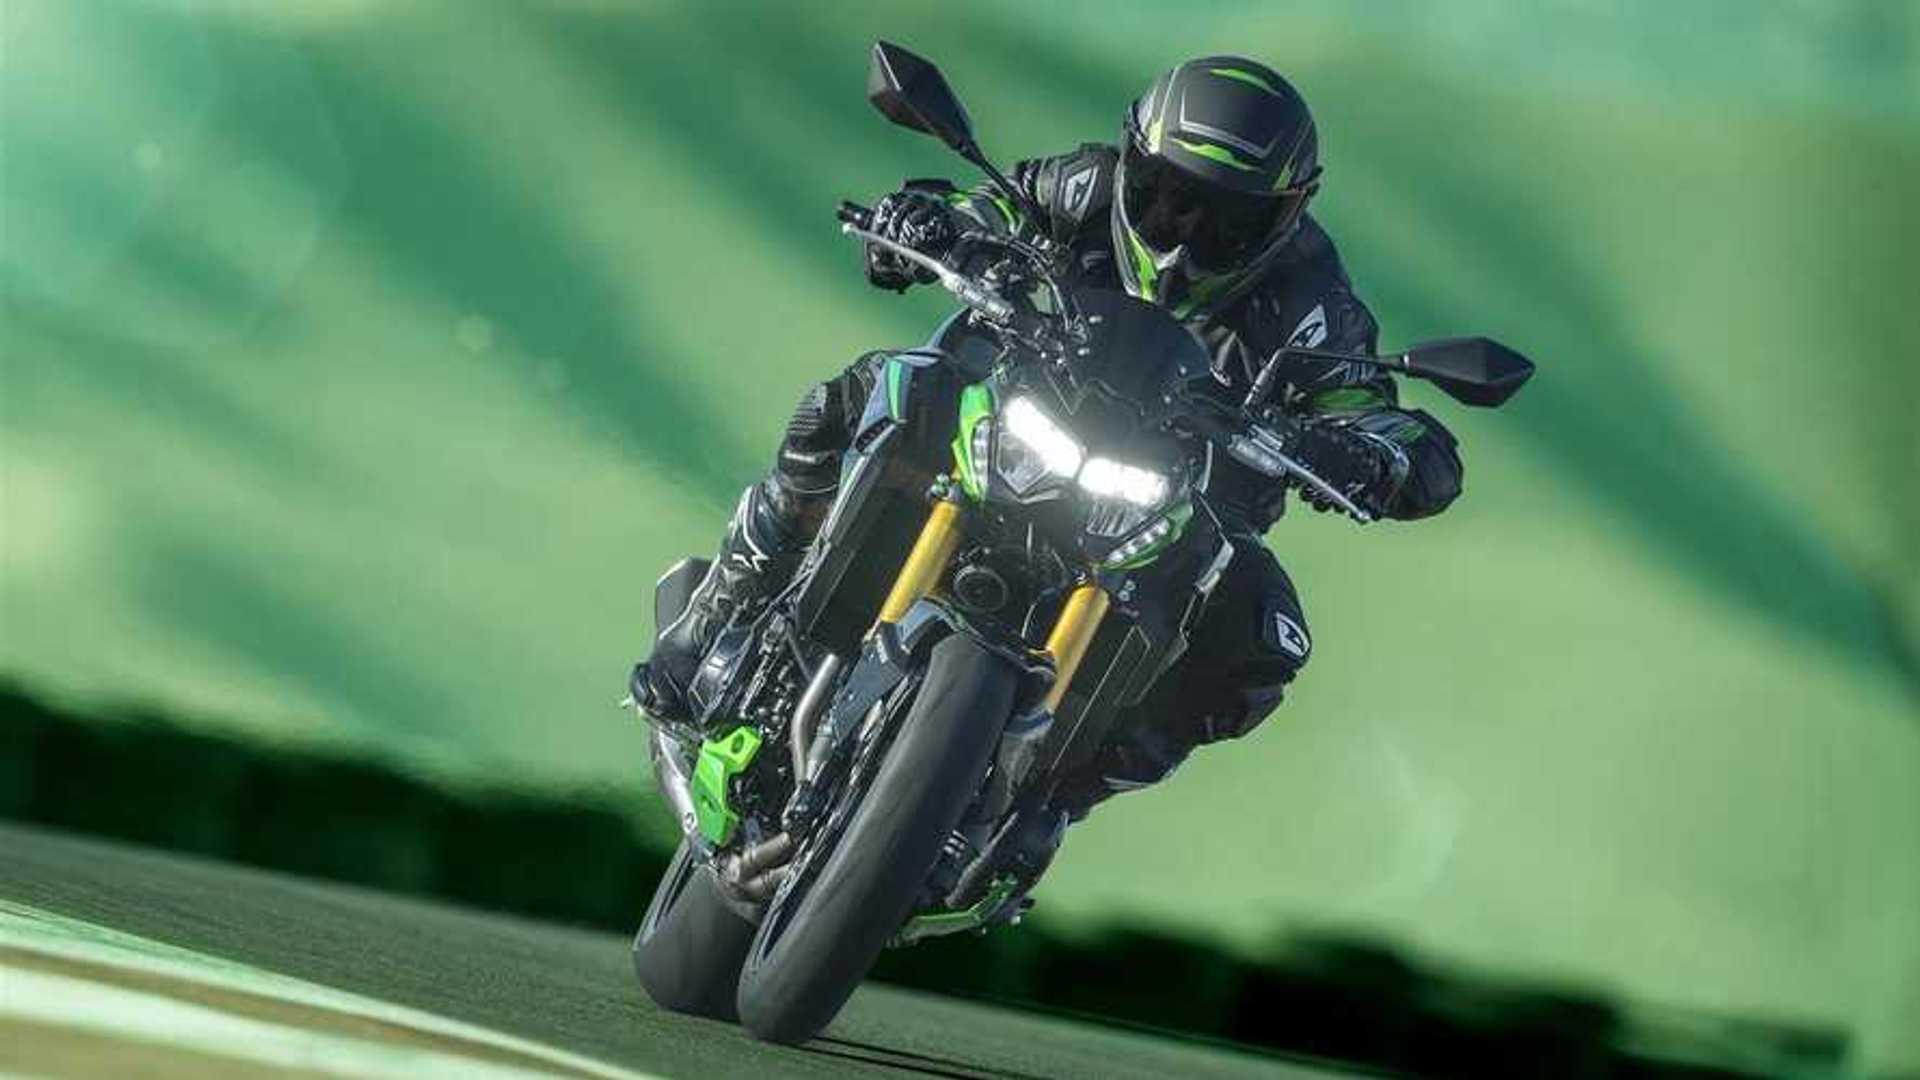 2022 Kawasaki Z900 SE - Front, Track